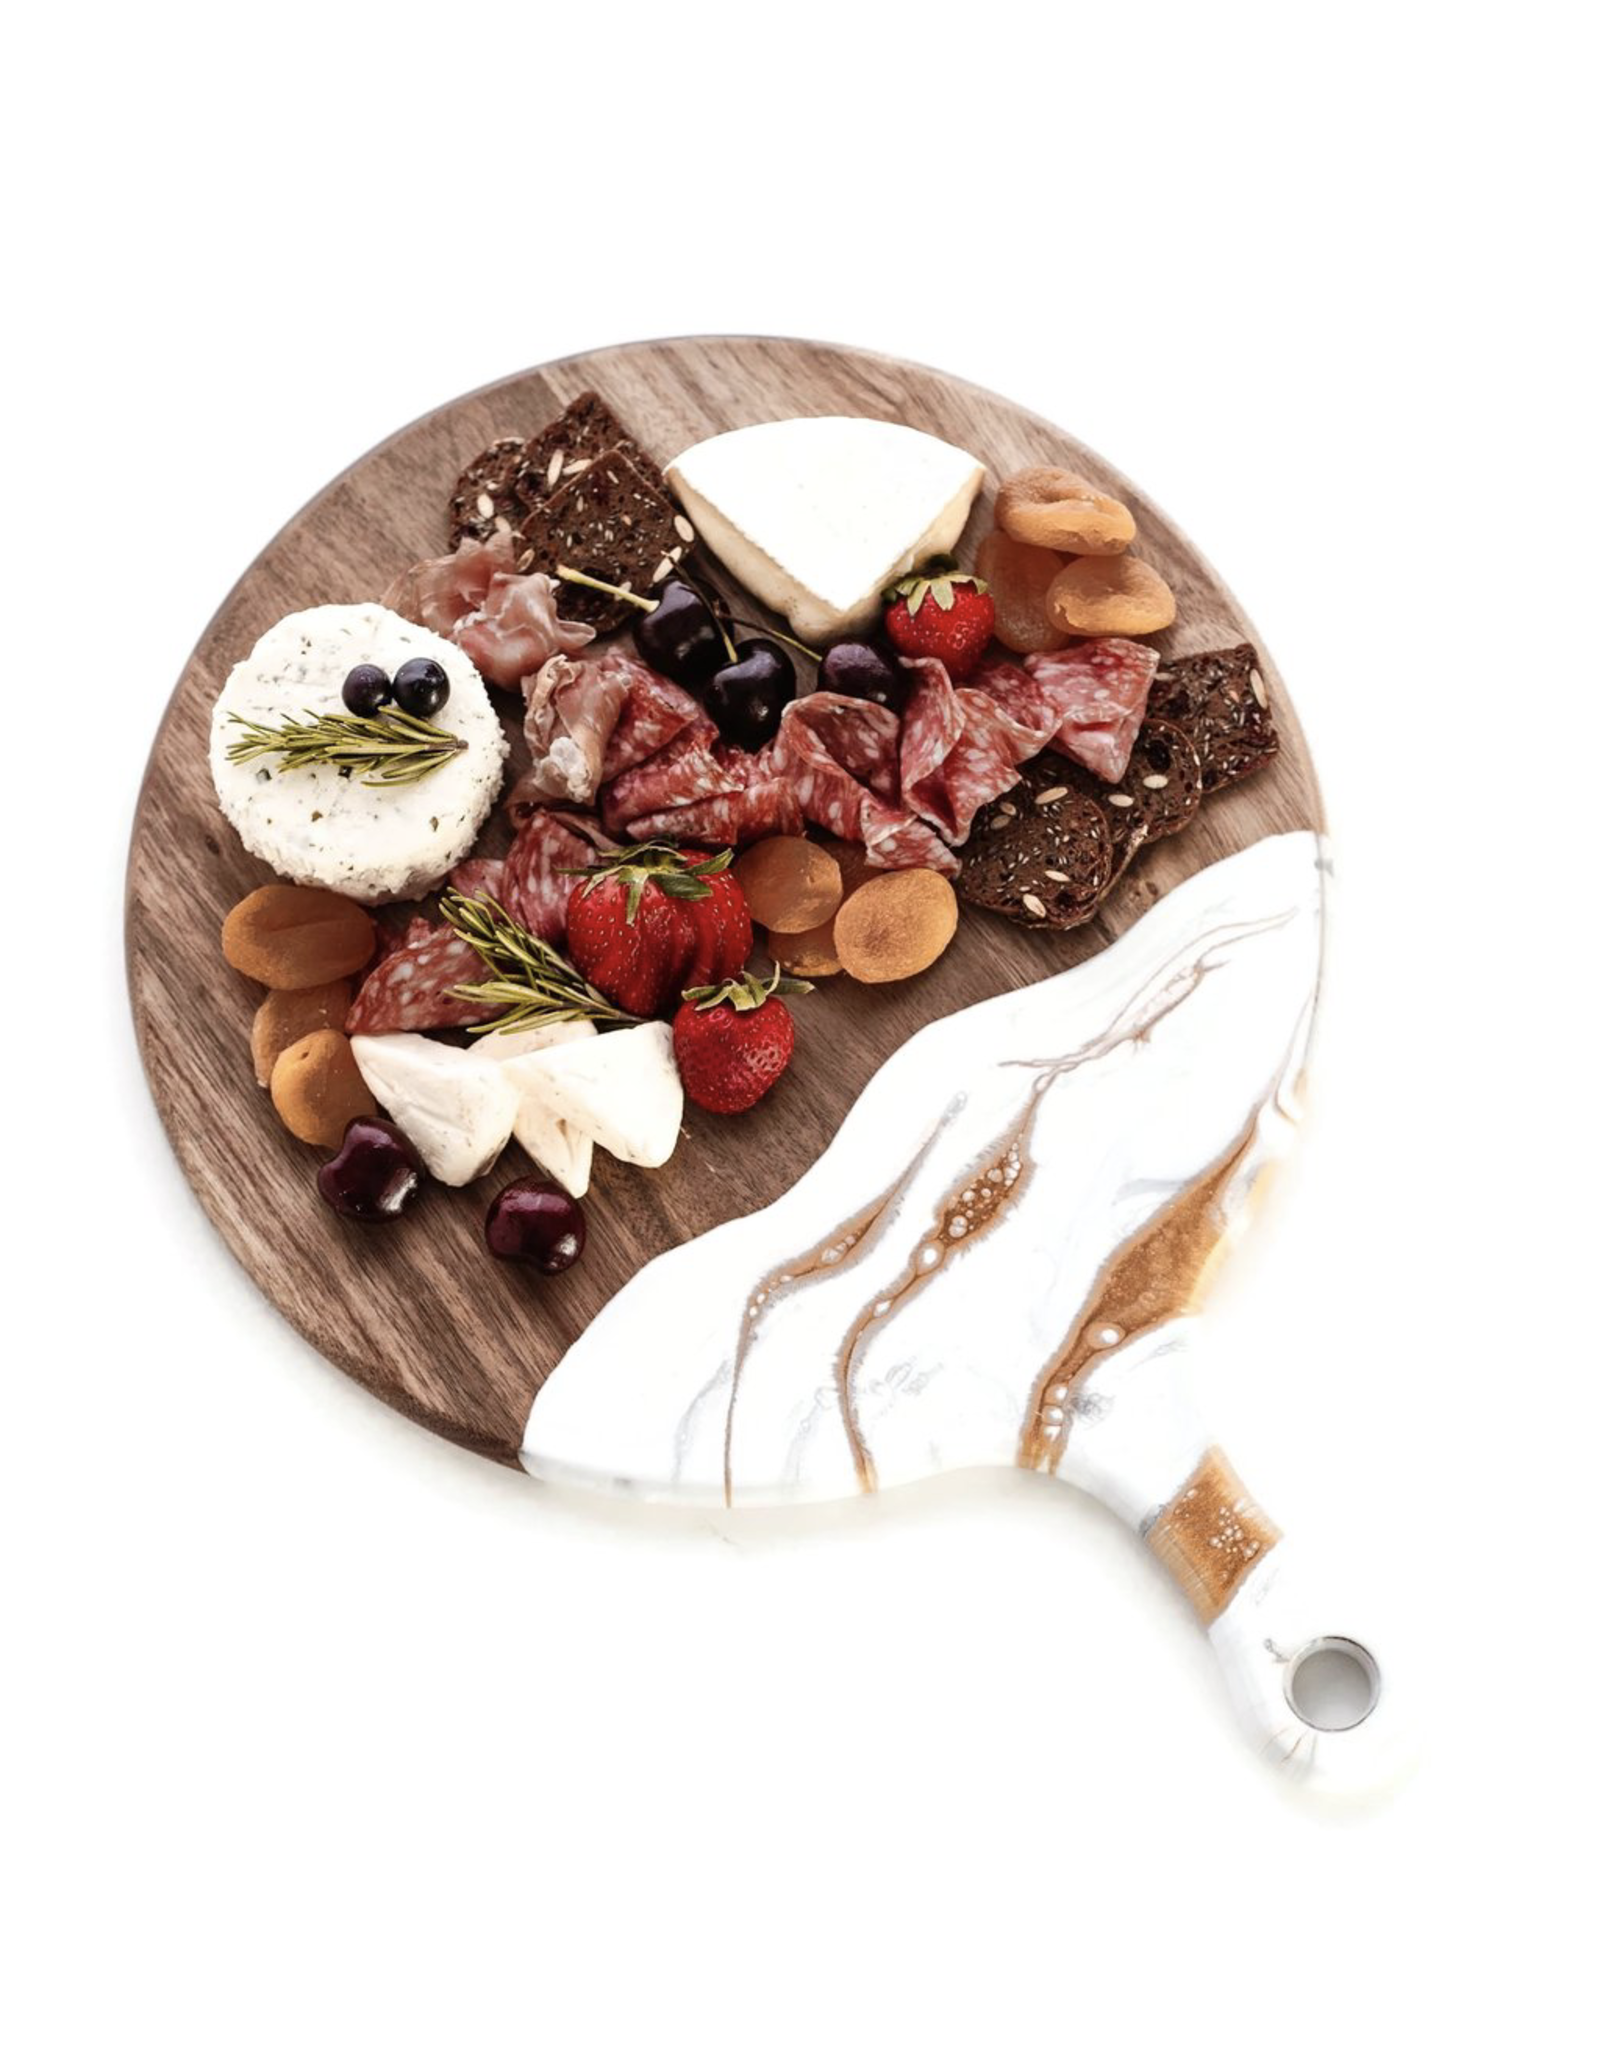 Lynn & Liana Acacia White, Grey & Gold Round Cheeseboard with Handle